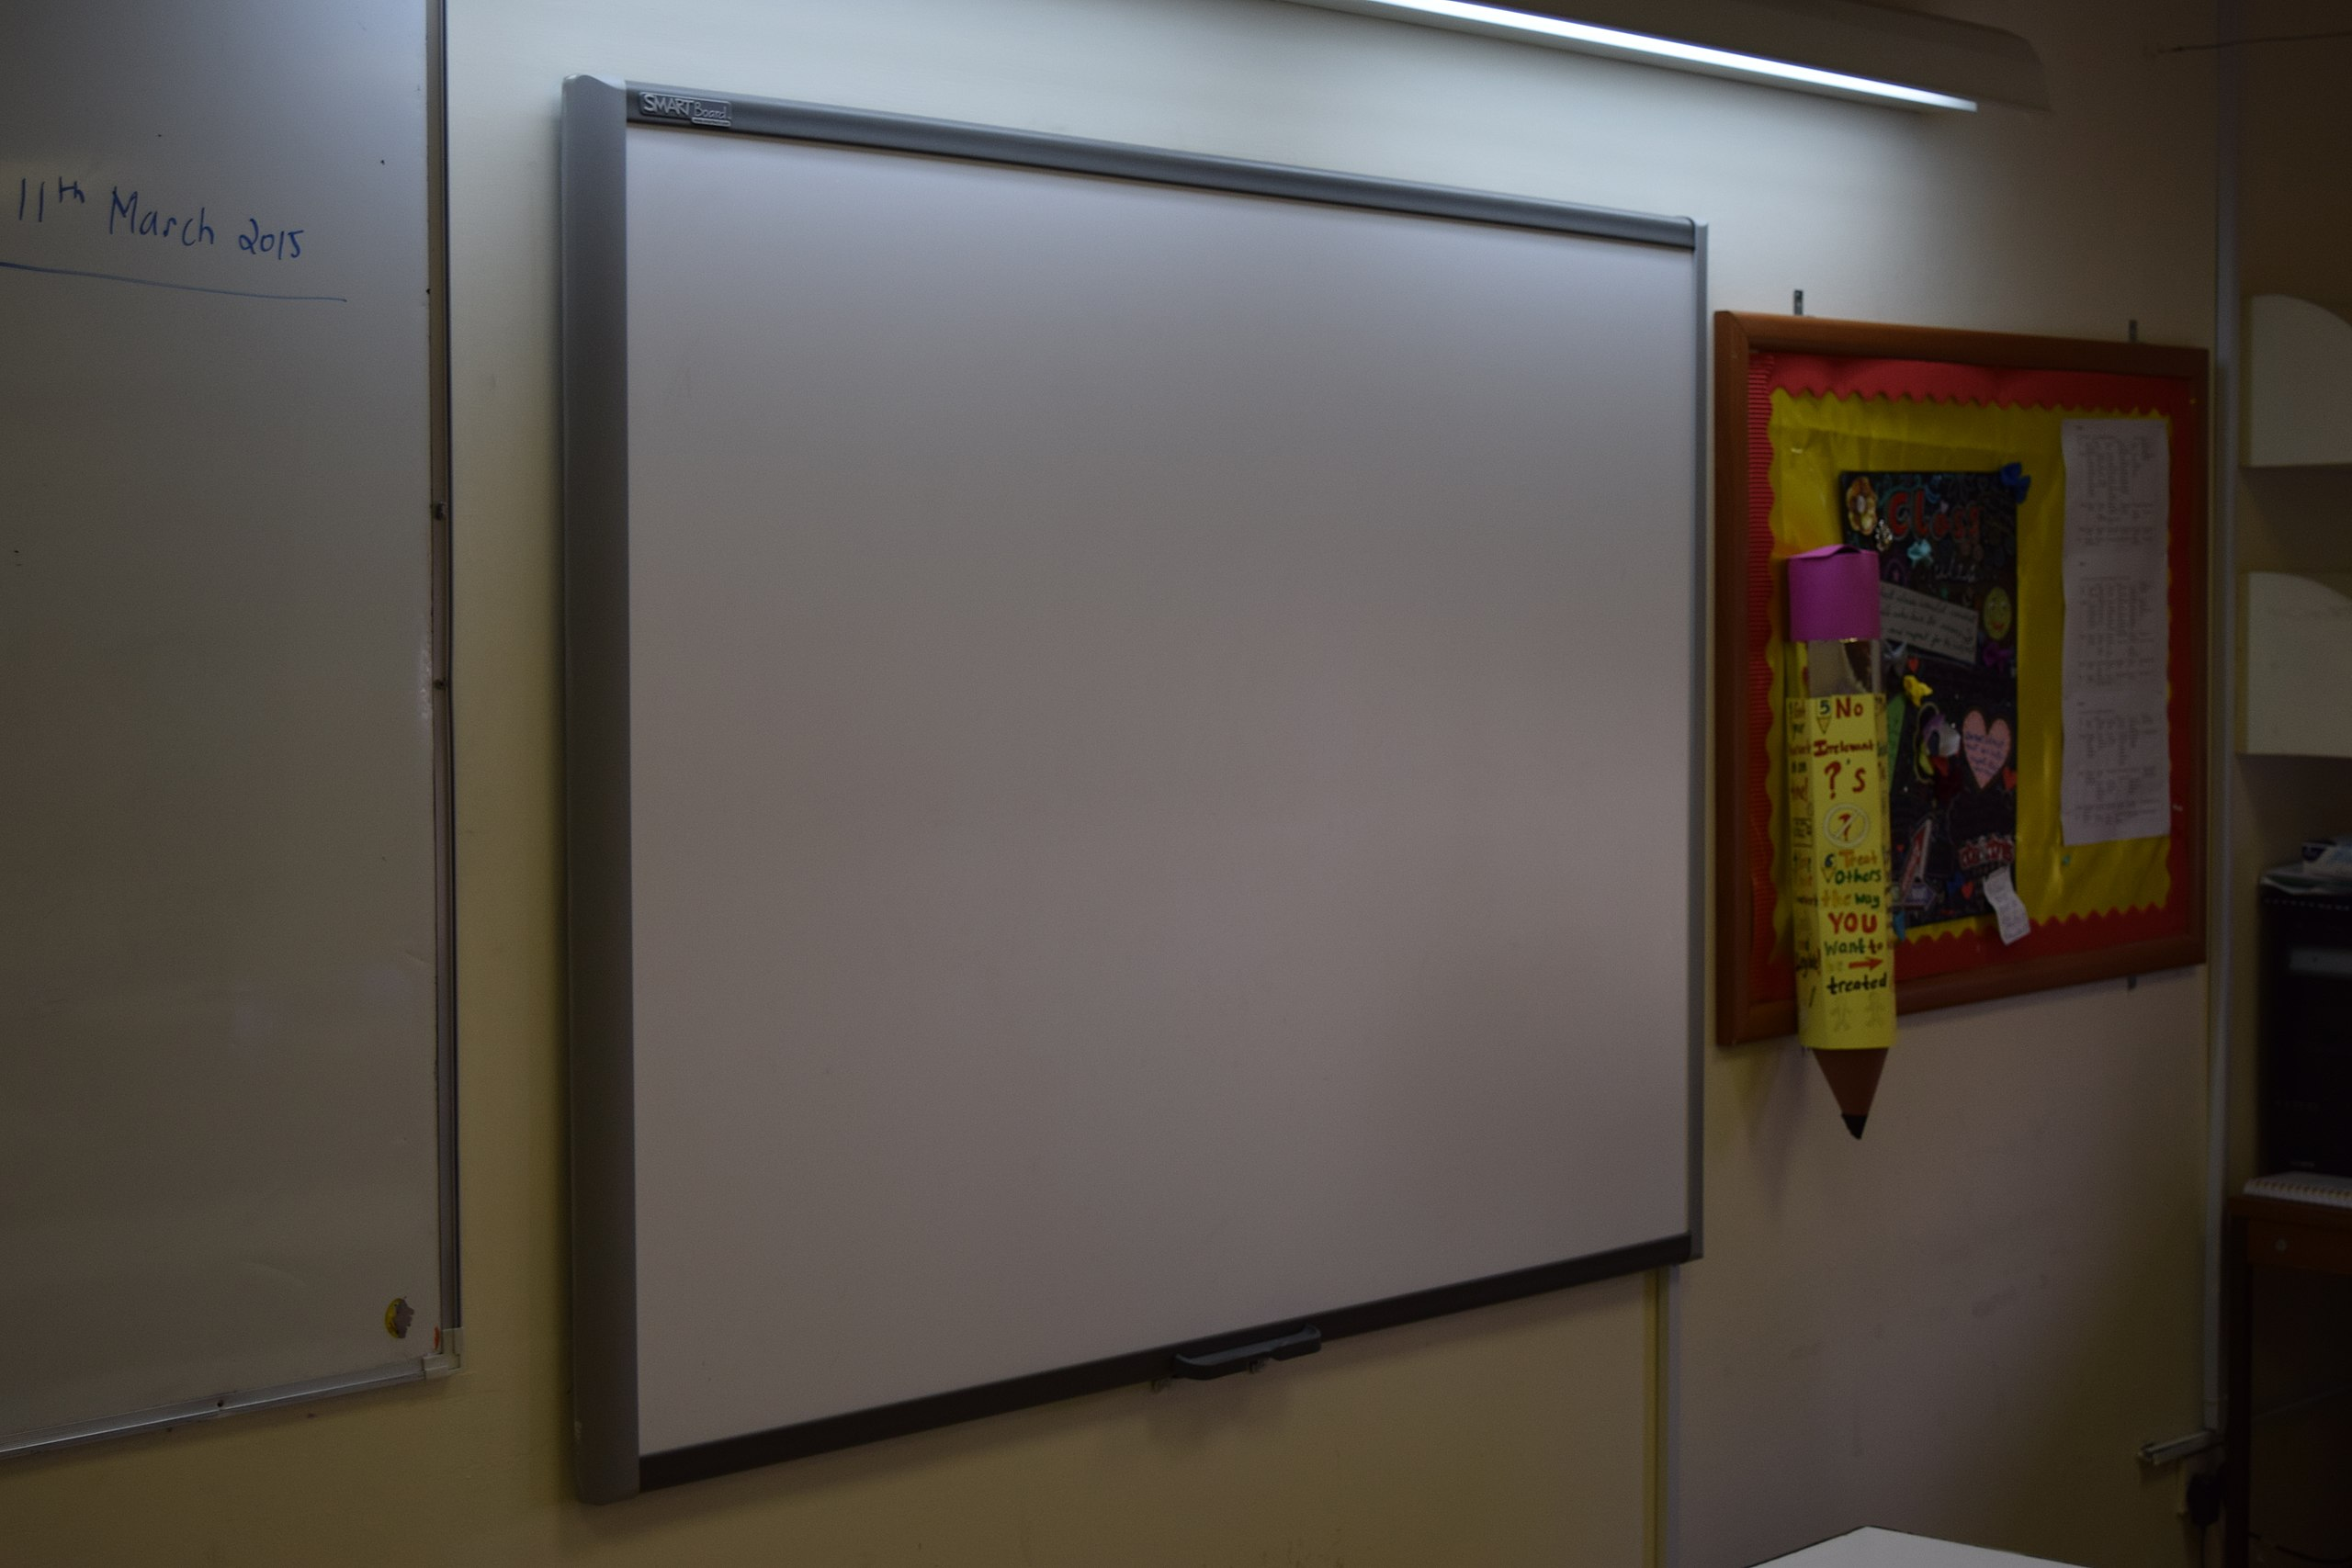 File:Smart interactive whiteboard.jpg - Wikimedia Commons